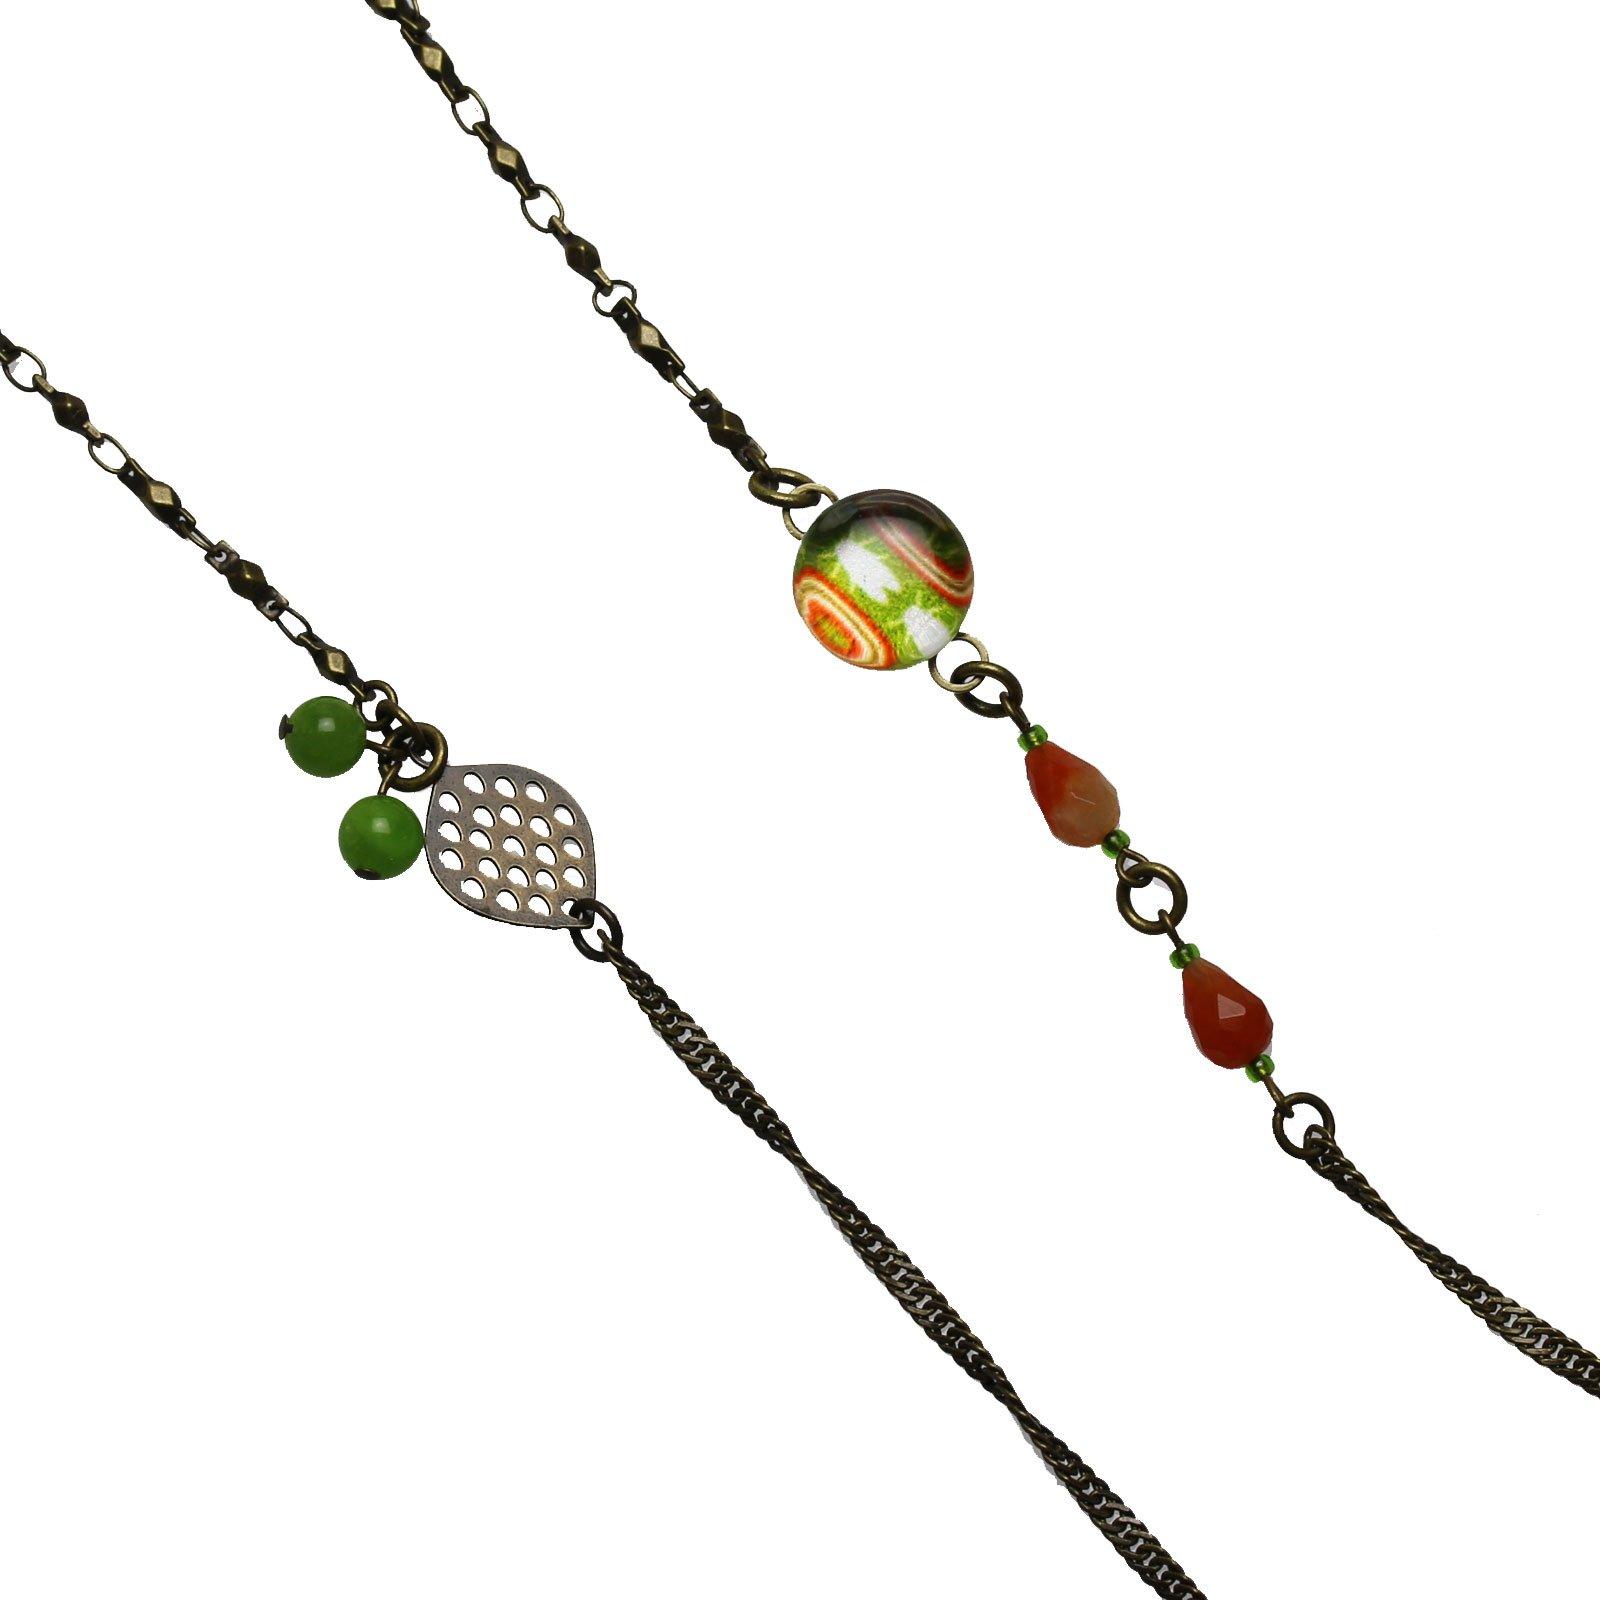 Tamarusan Glasses Chain Cicada Green Carnelian Glass Cord Handmade by TAMARUSAN